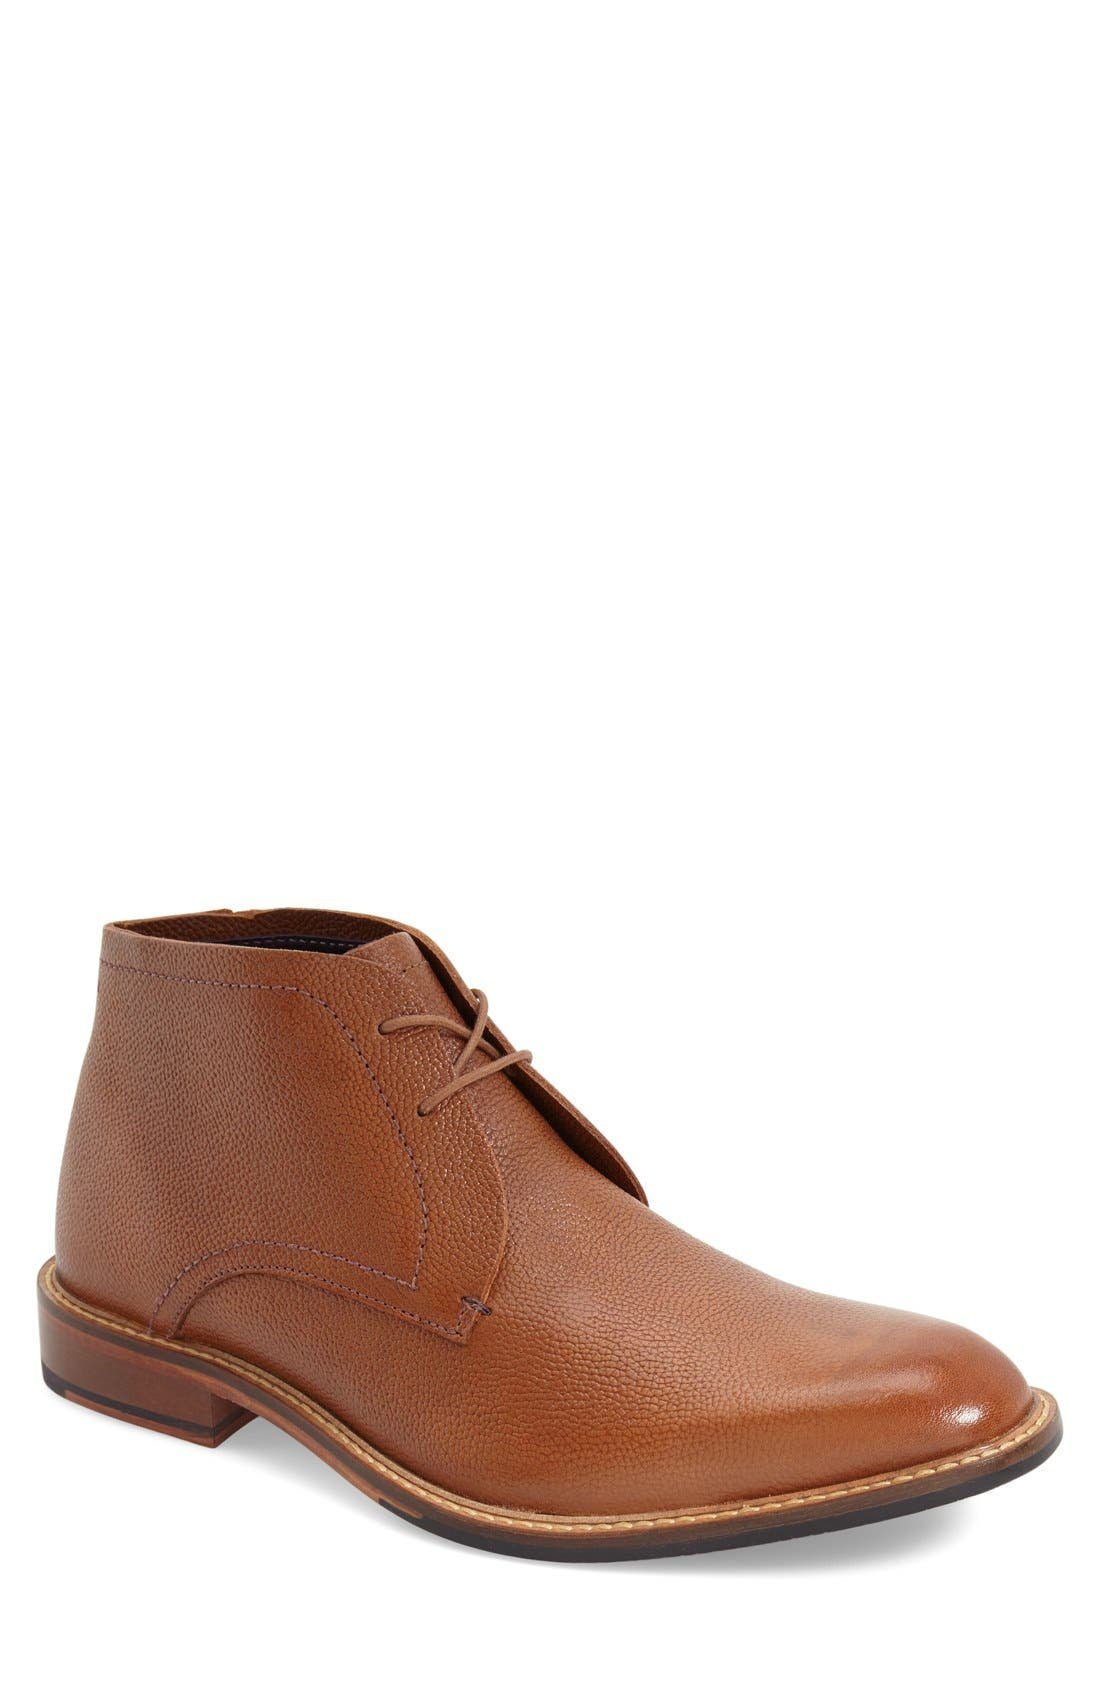 'Torsdi 4' Chukka Boot,                         Main,                         color, 234